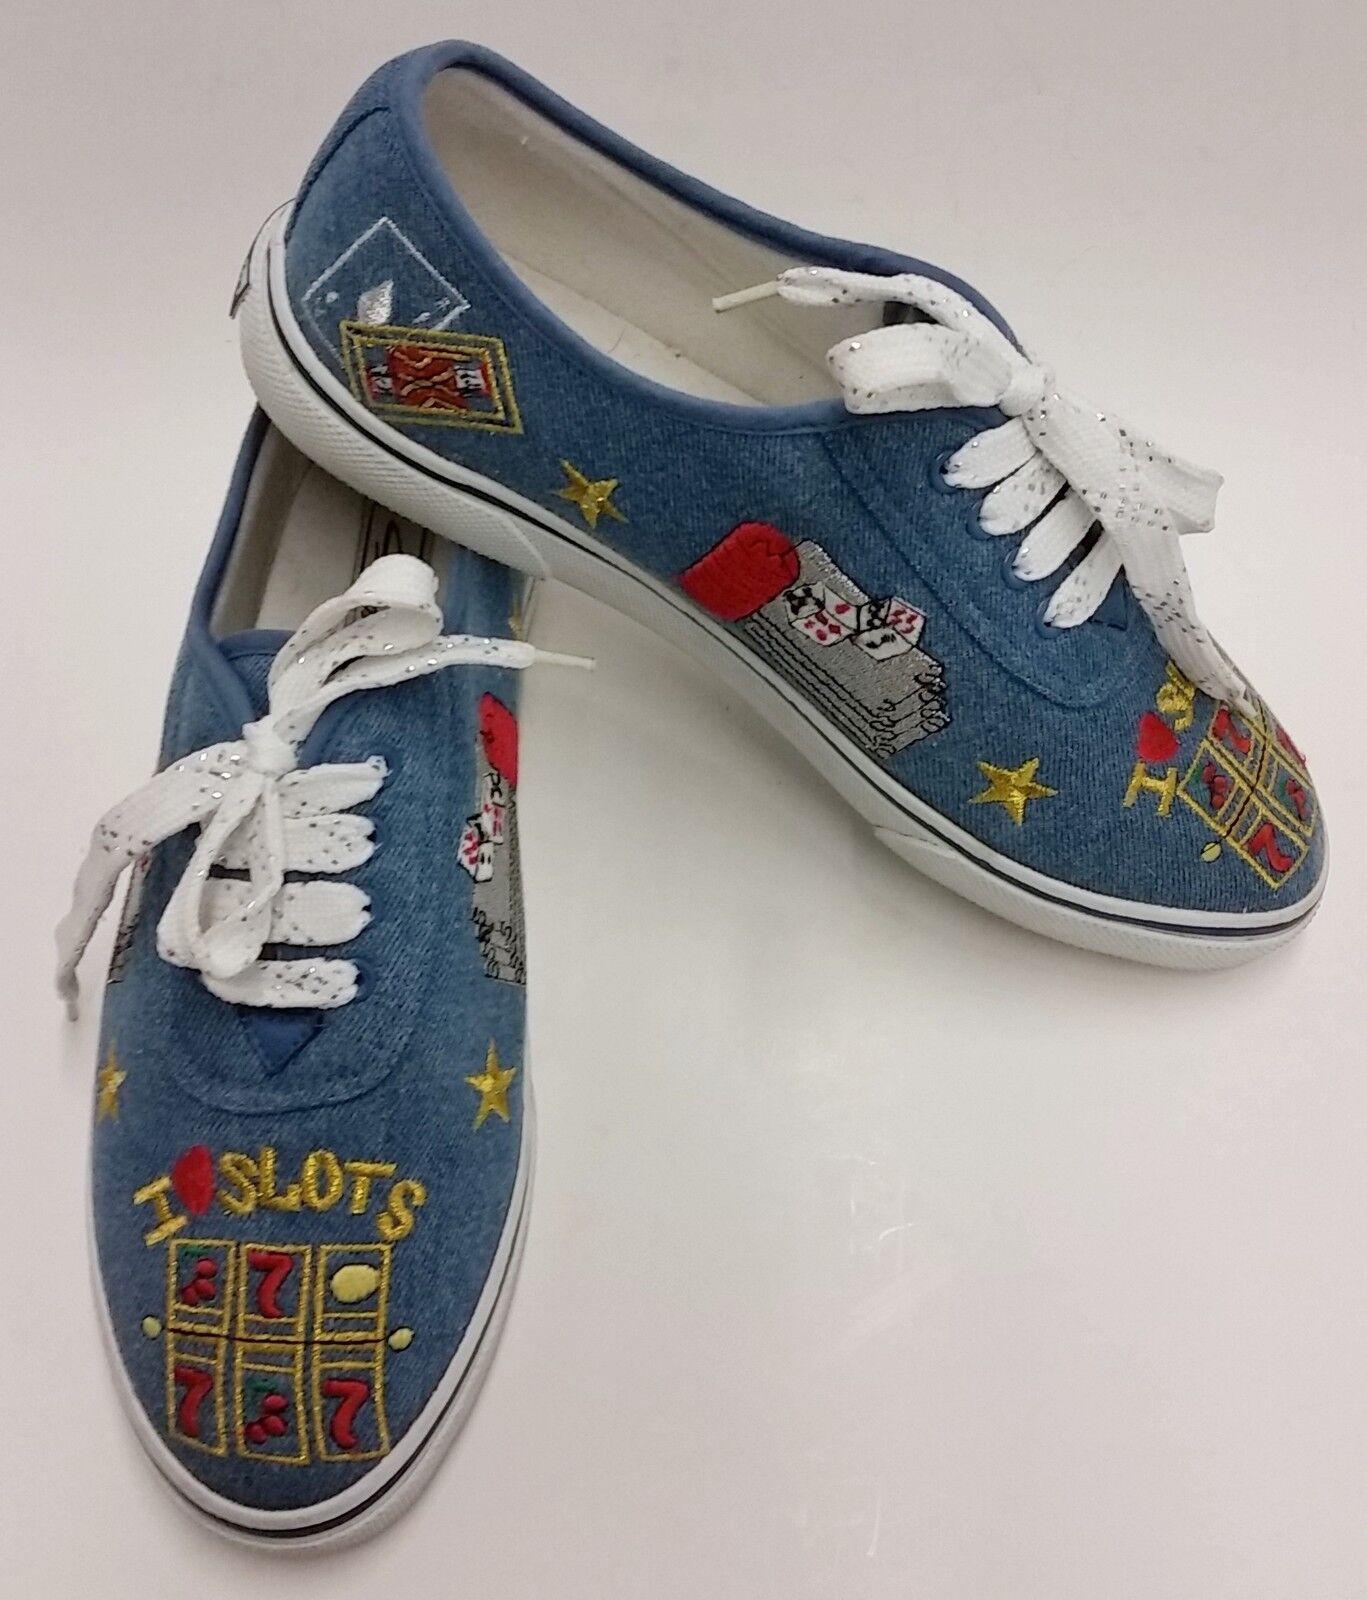 Slots Casino Sebastiso shoes Sneakers bluee Multi-color Womens Size 9 M